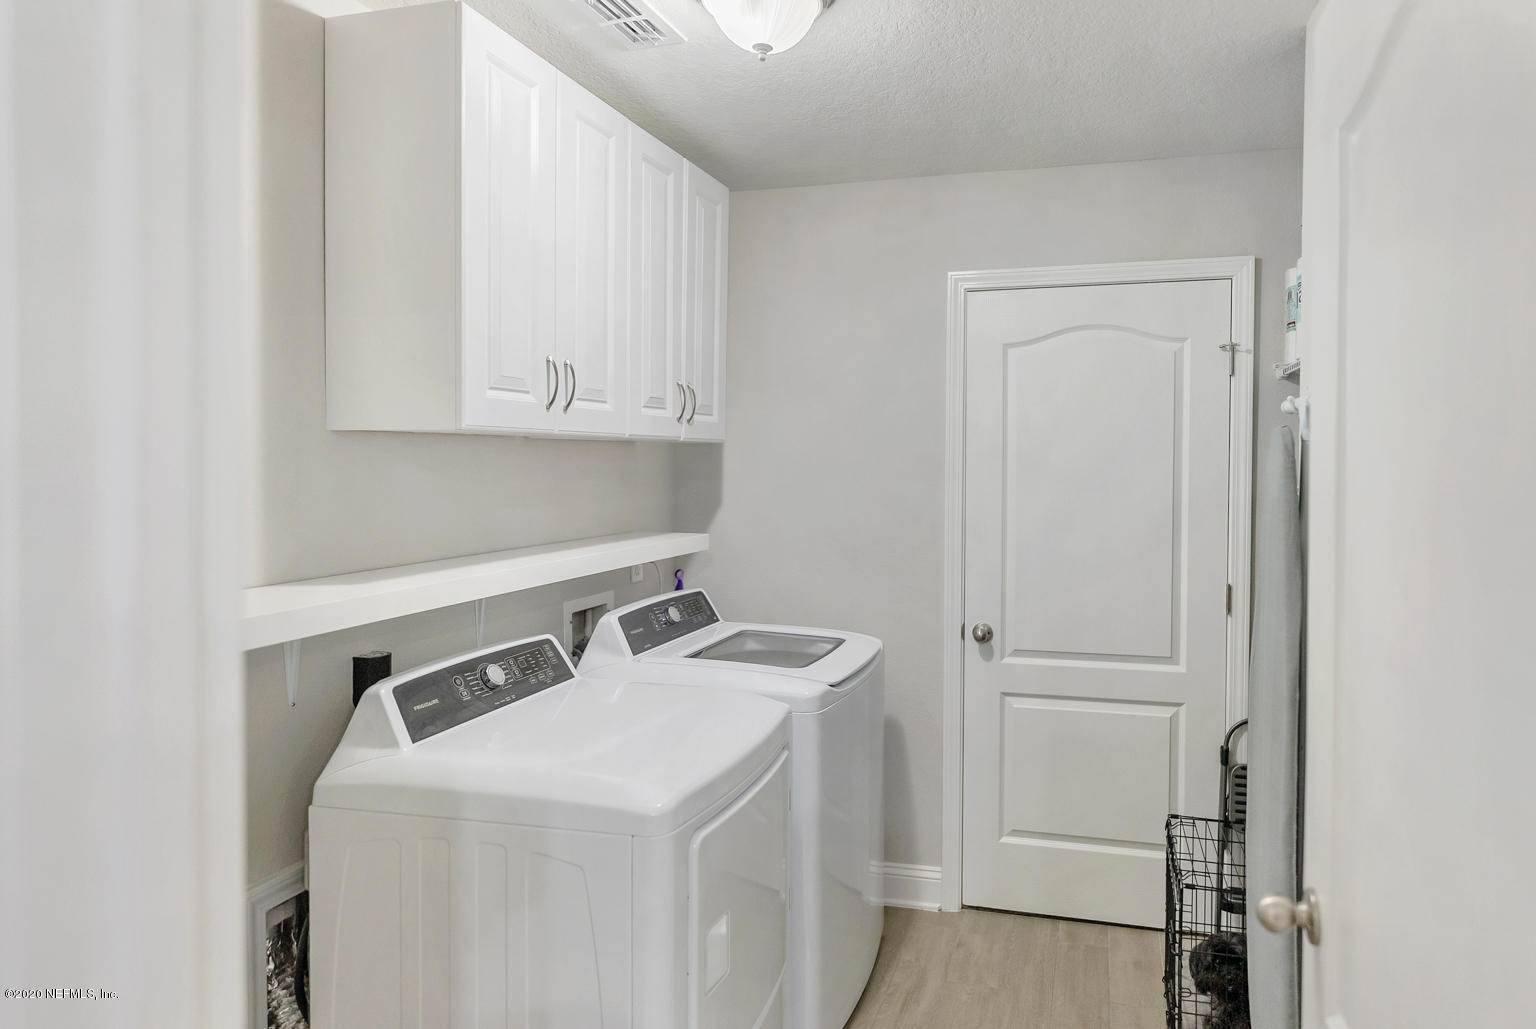 10070 KIT FOX, JACKSONVILLE, FLORIDA 32222, 4 Bedrooms Bedrooms, ,2 BathroomsBathrooms,Residential,For sale,KIT FOX,1082278